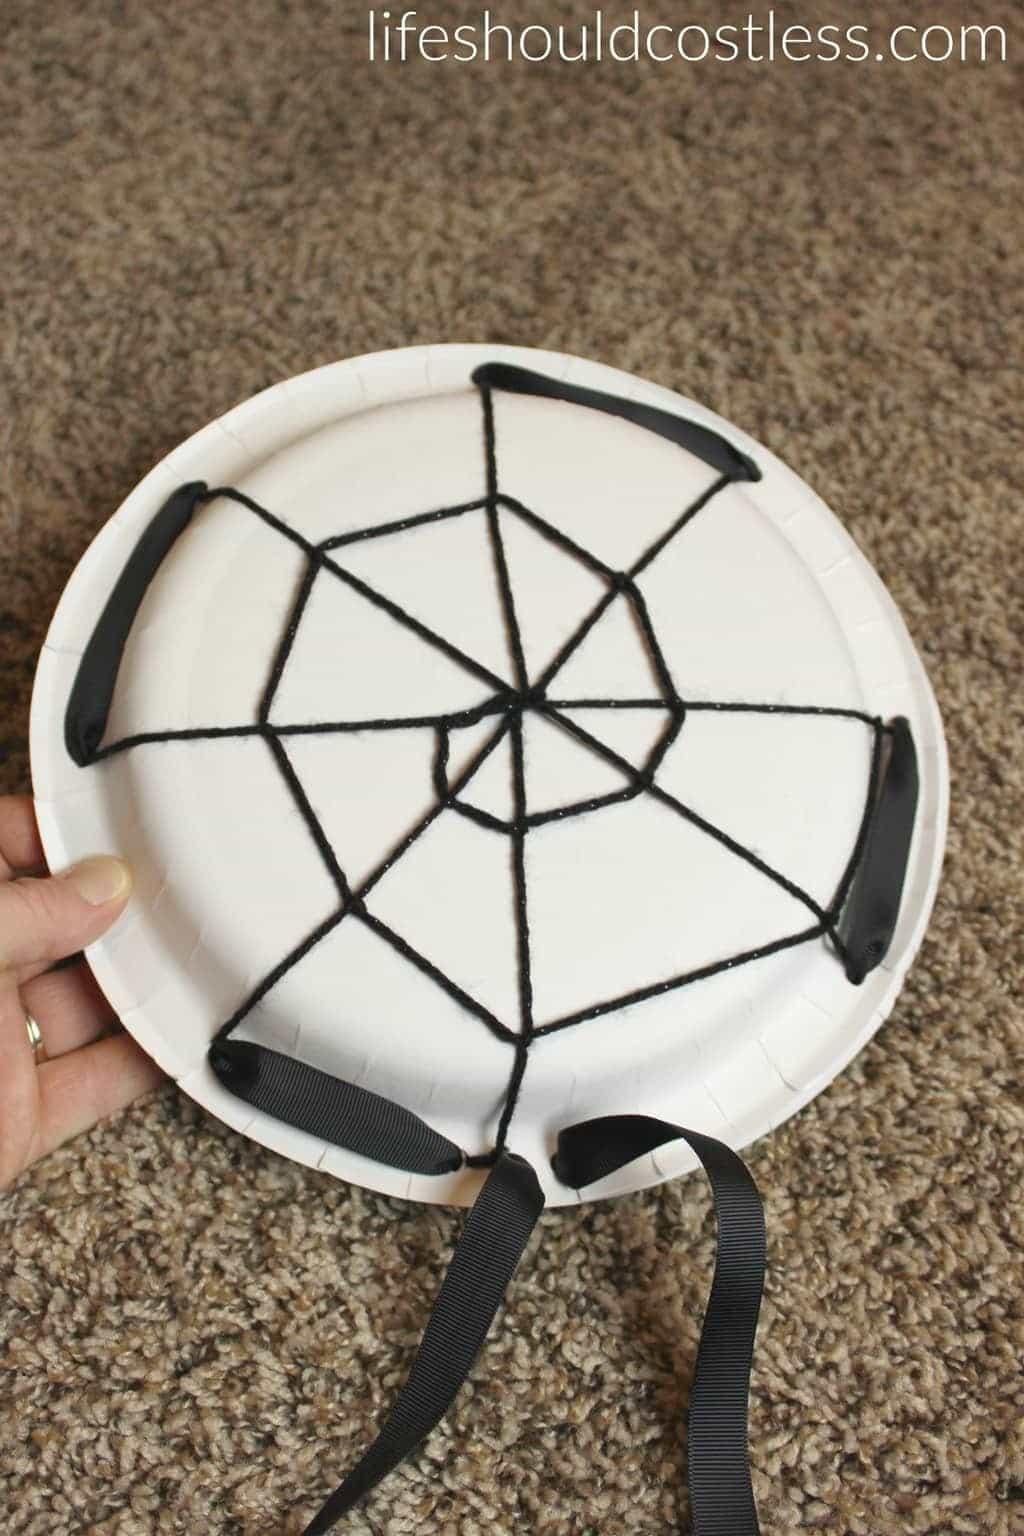 Halloween Spider Web Treat Plates. See this and many more popular seasonal pins at lifeshouldcostless.com.